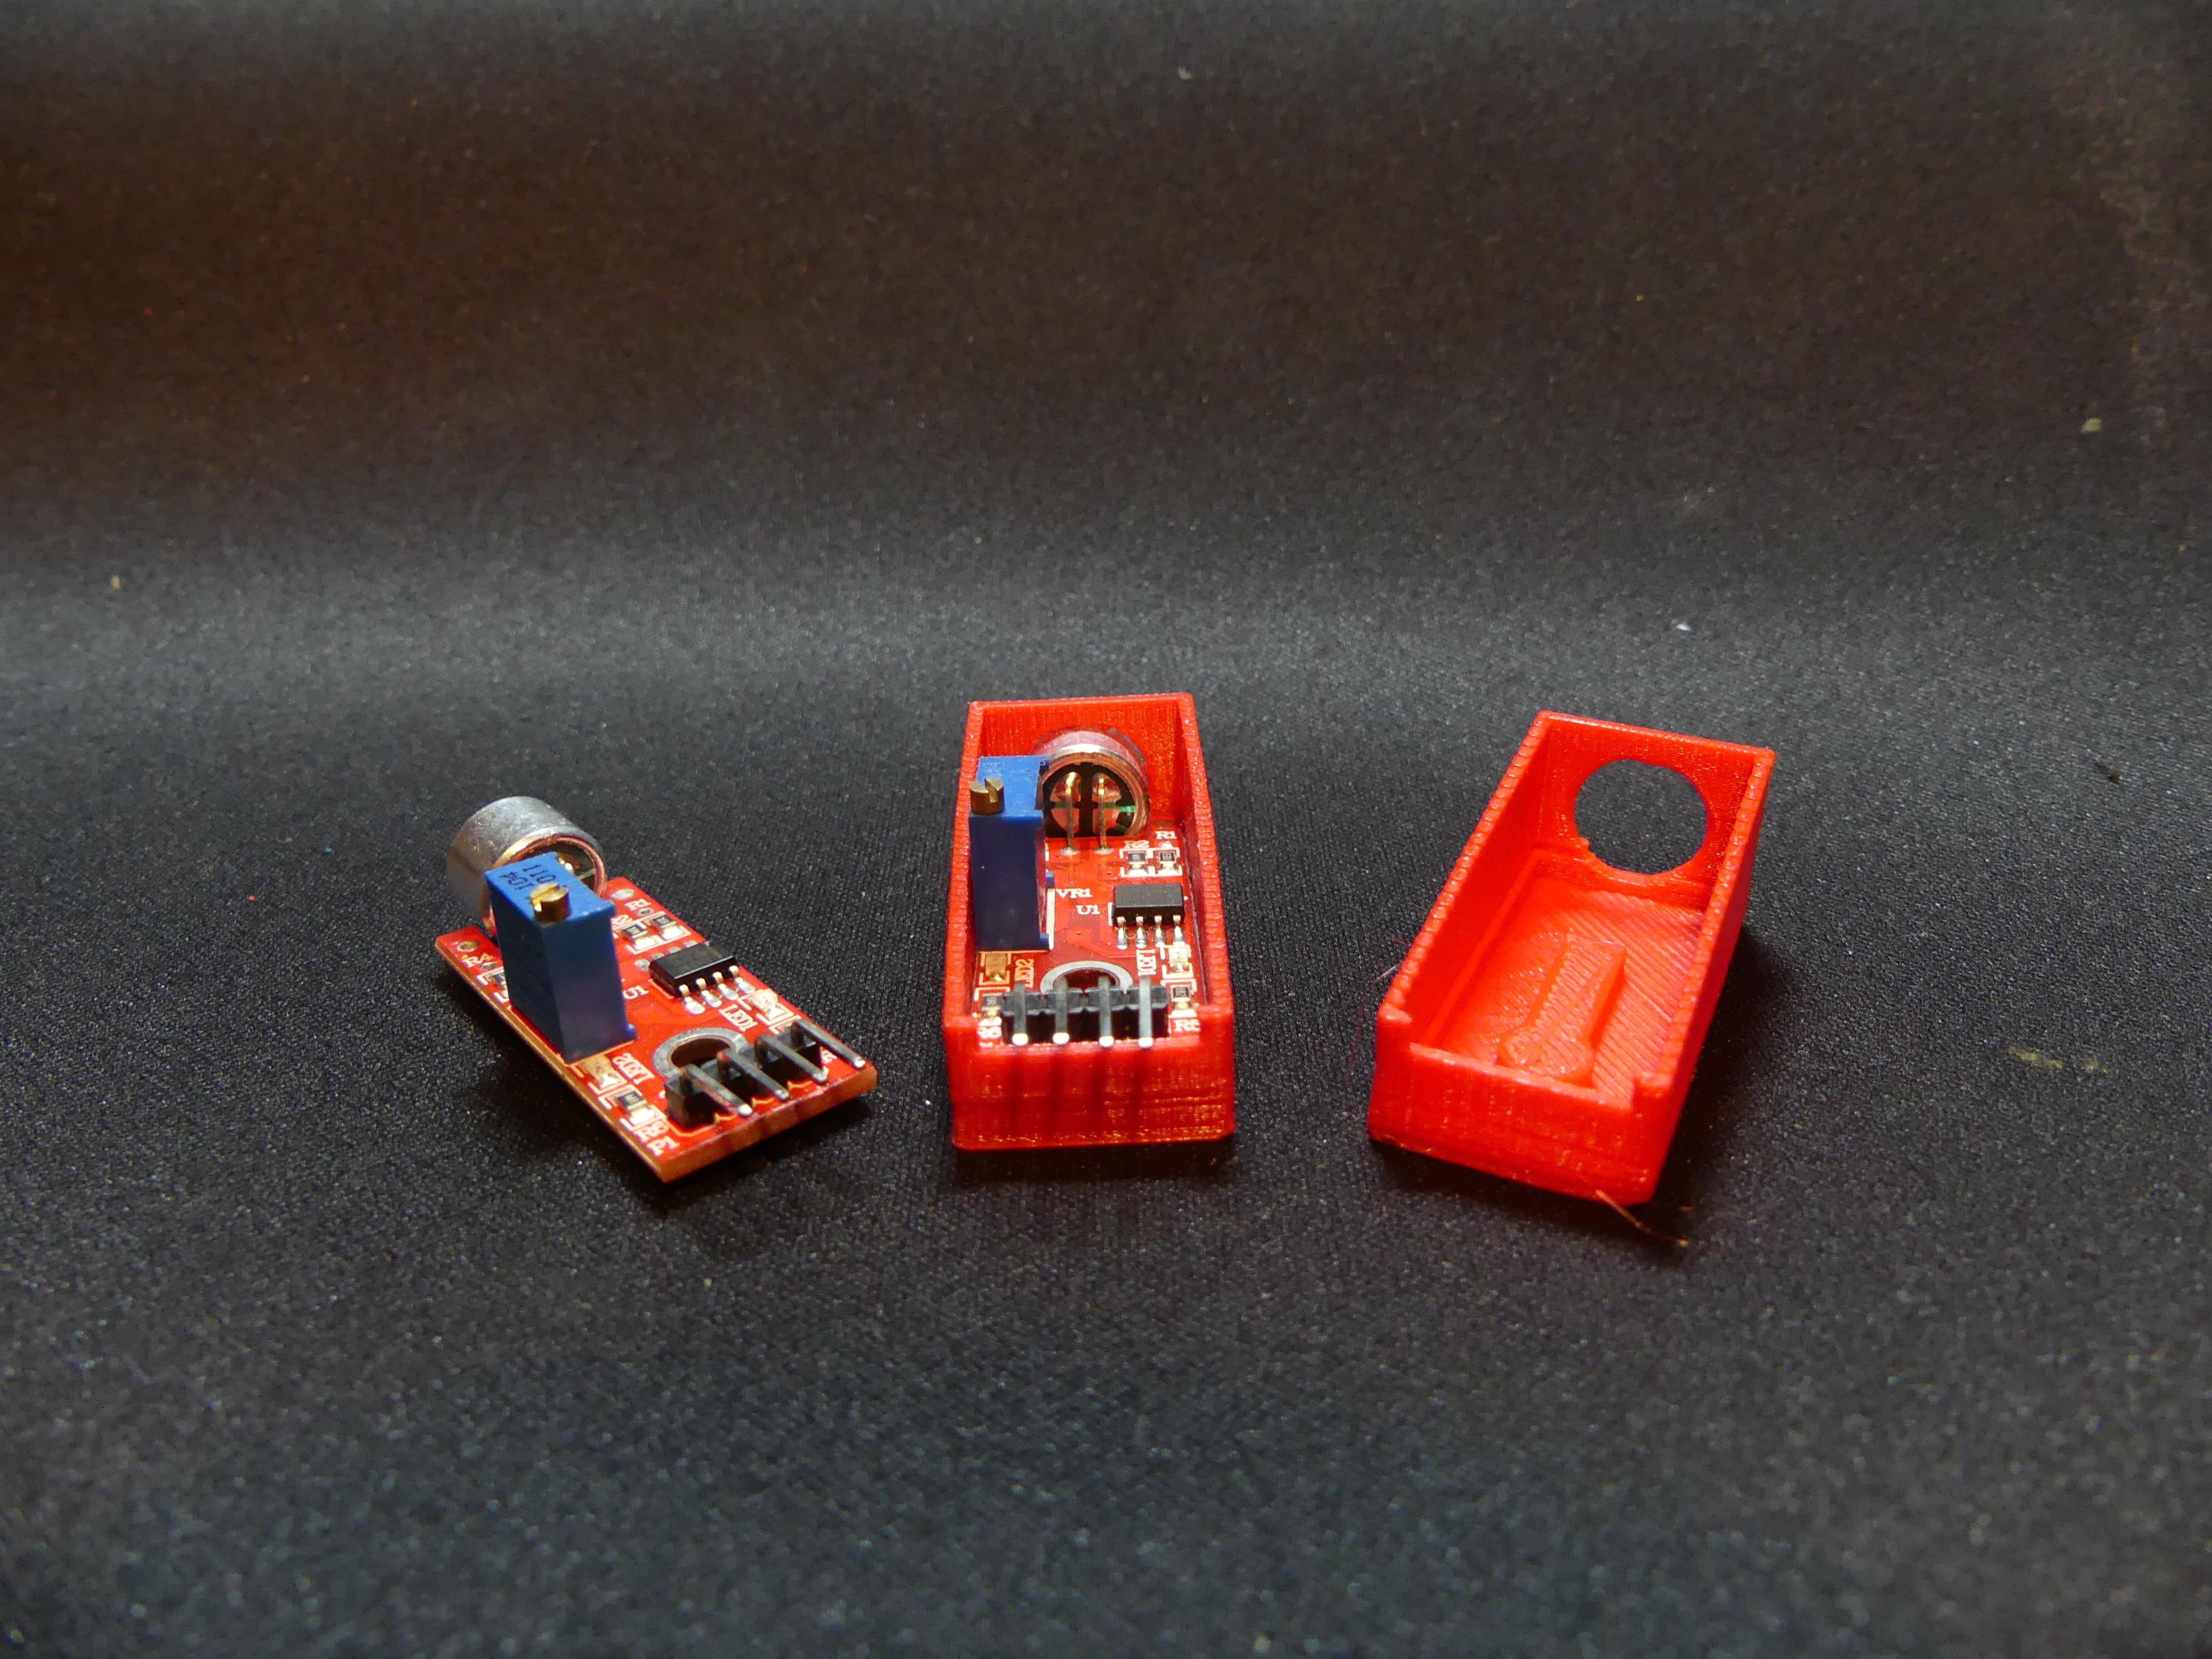 P1140350.JPG Download free STL file Arduino Sound Sensor Bracket • 3D printable template, Linventif